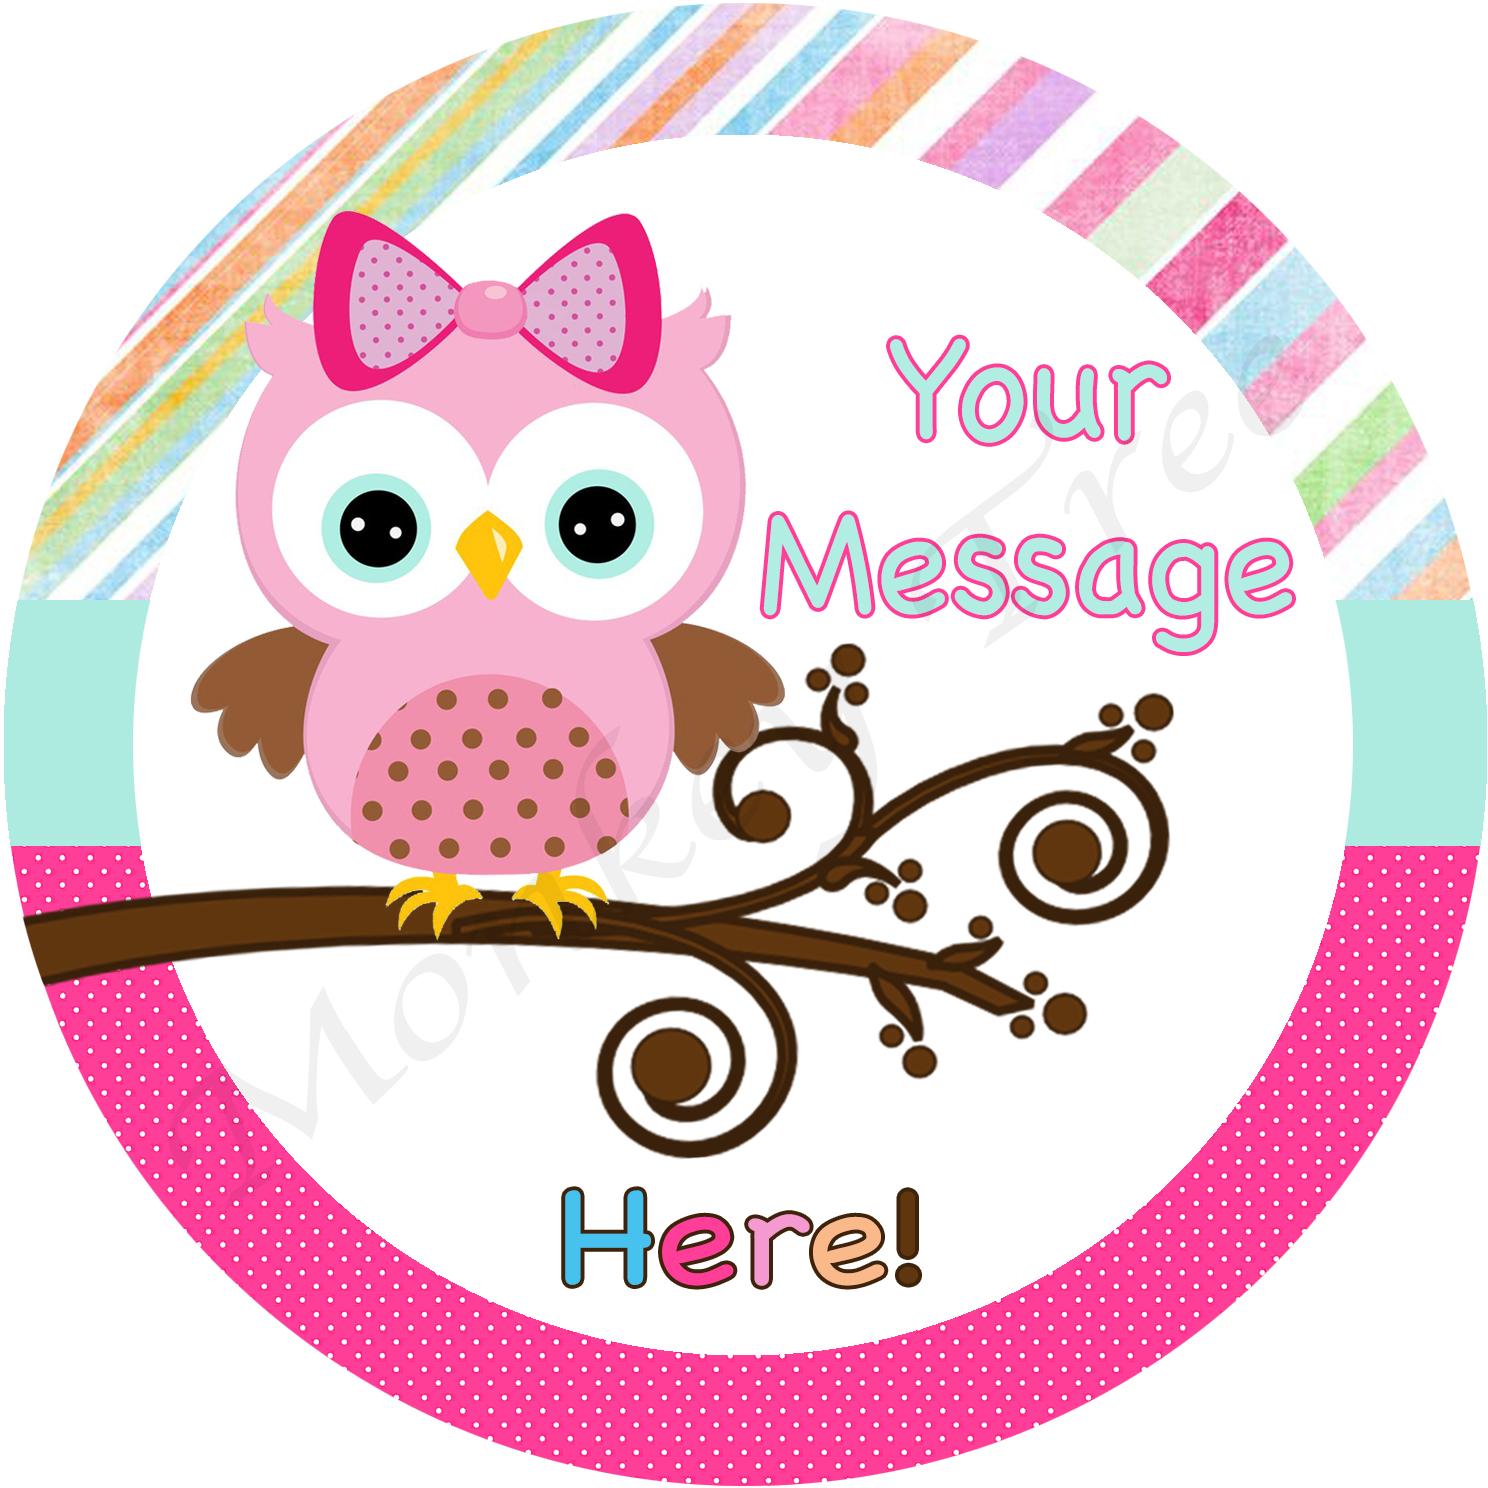 Edible Cake Image Owl : Pink Owl Personalised Edible Cake Image The Monkey Tree